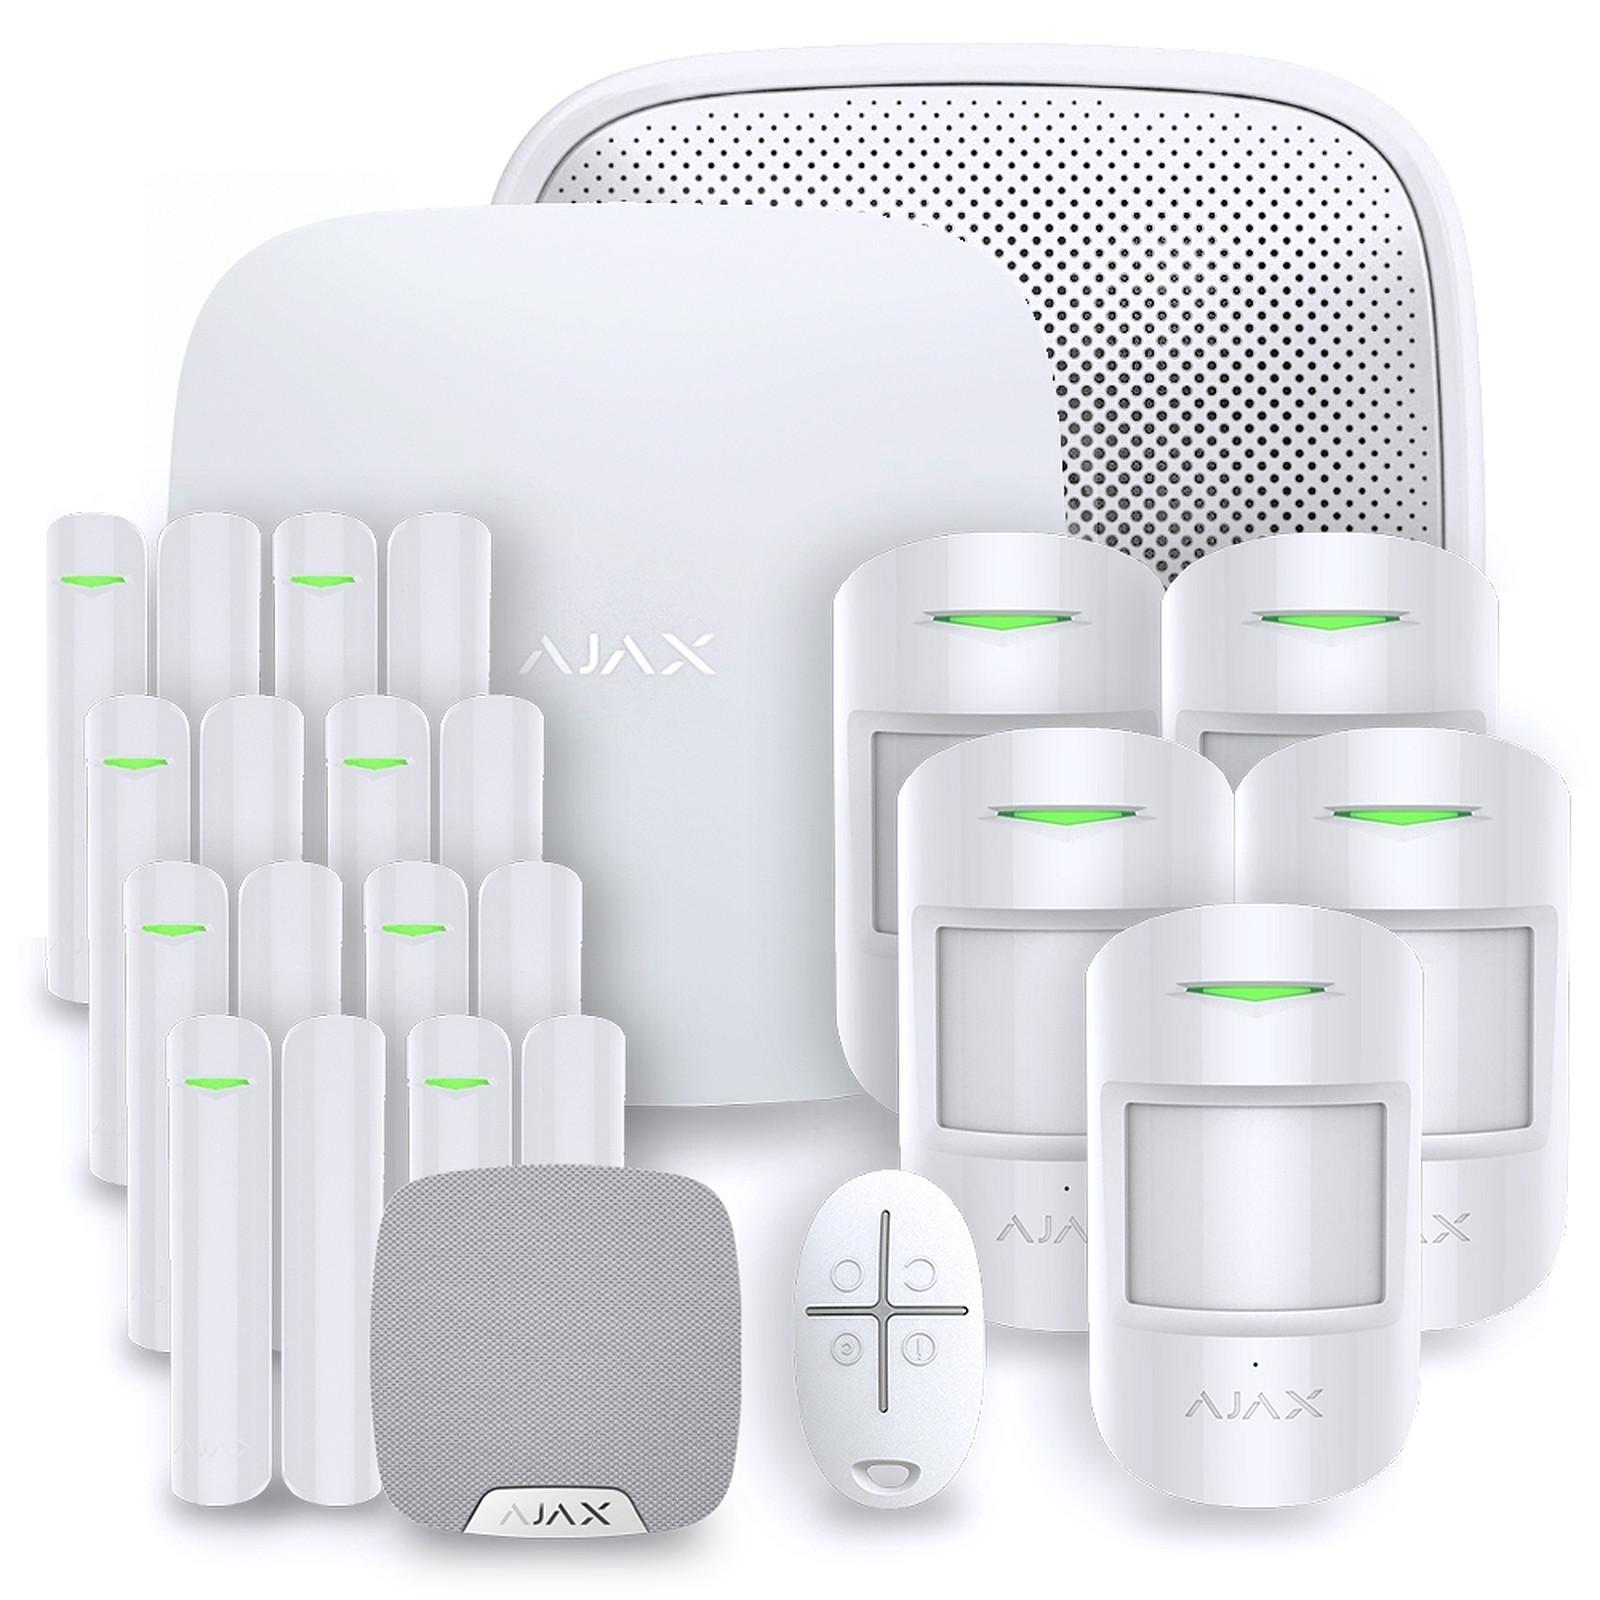 Ajax Alarme maison StarterKit blanc  Kit 6